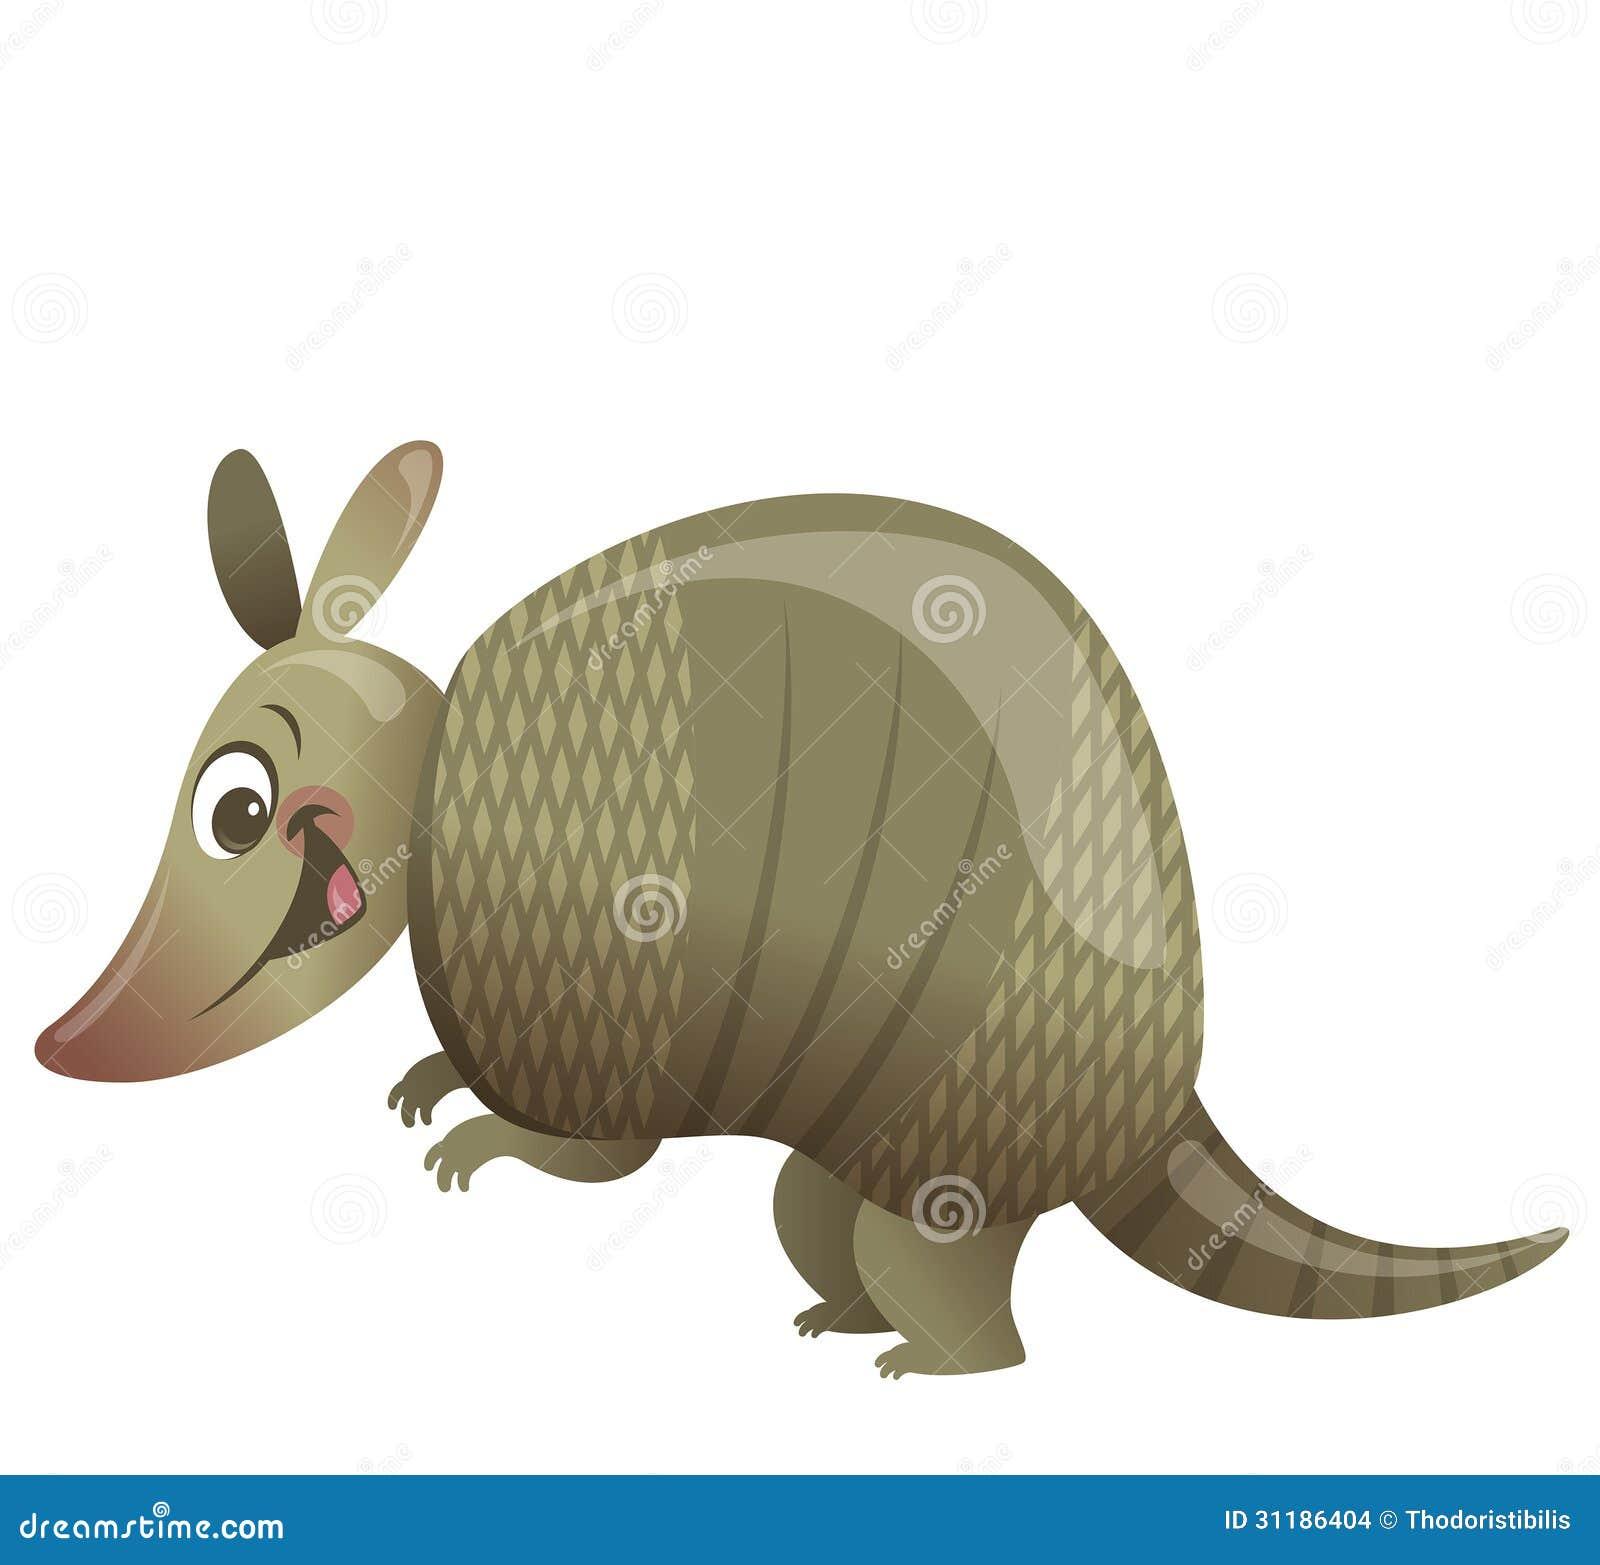 Cartoon Armadillo Animal Stock Images - Image: 31186404